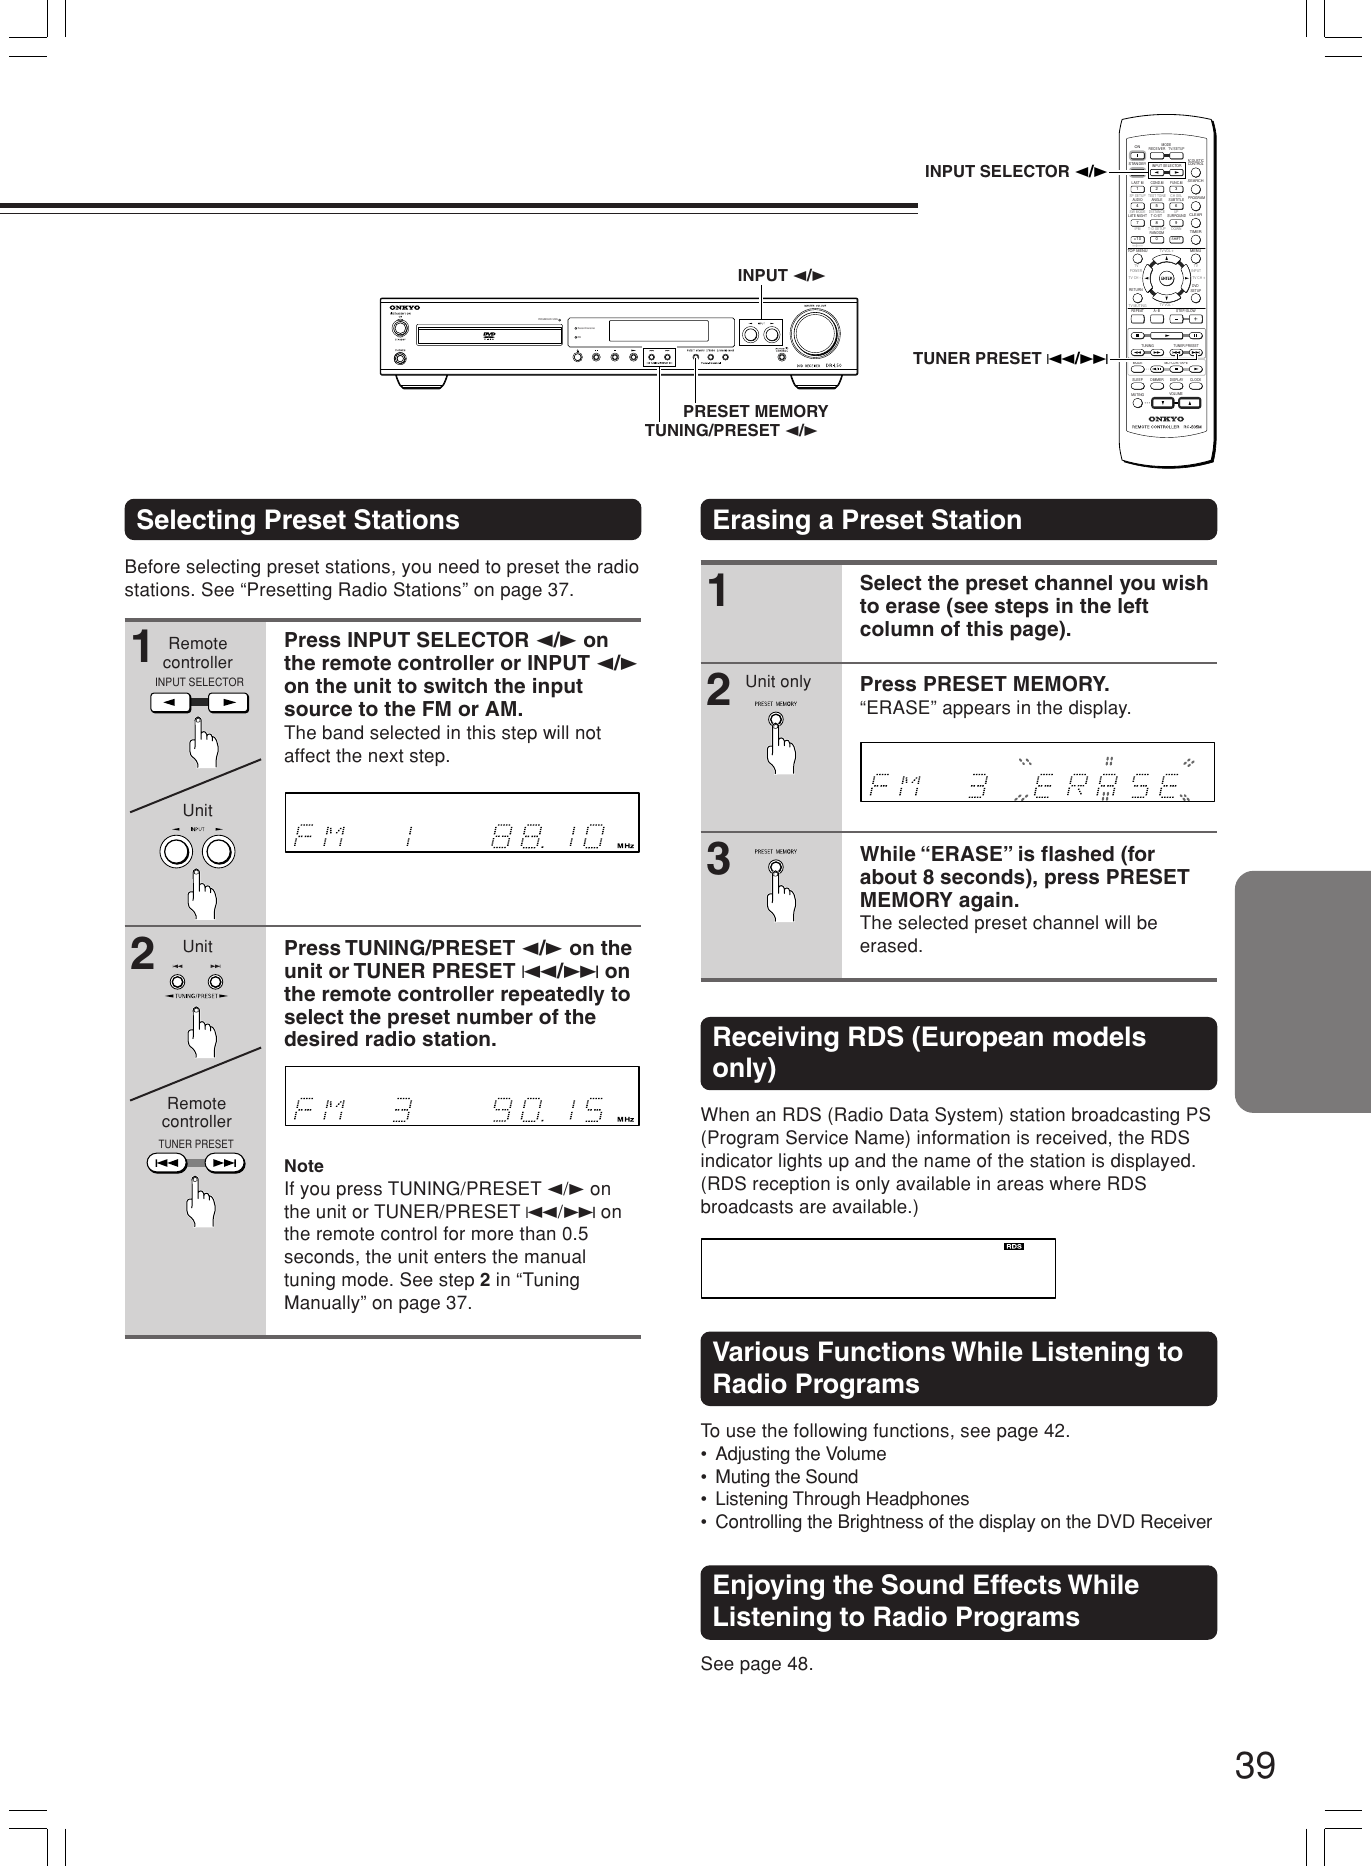 Onkyo Dr L50 Users Manual #DRL50 0E 01 01 p65